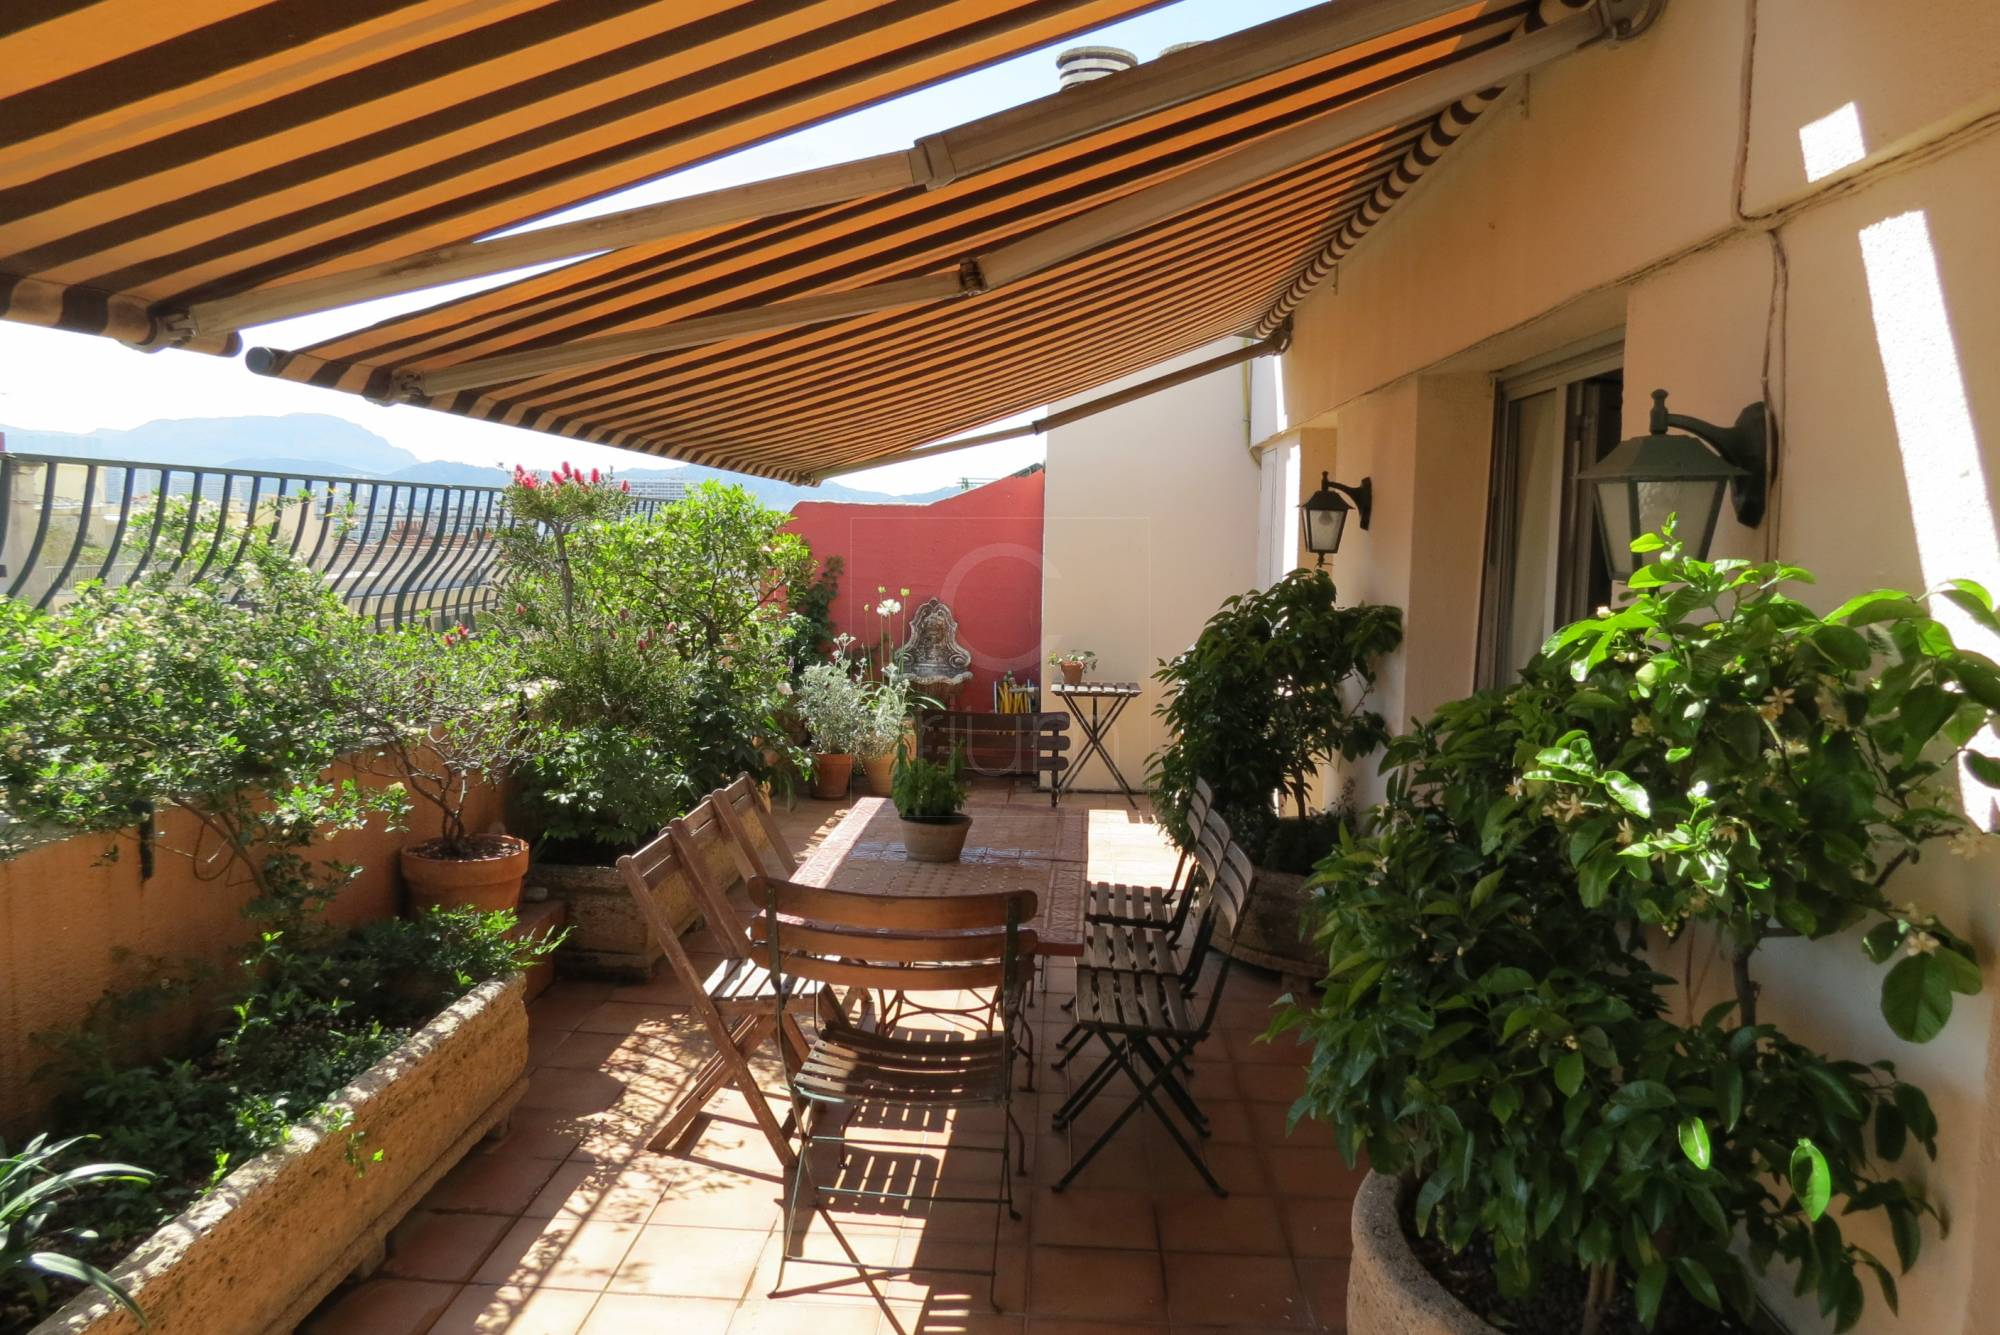 Vente Appartement T4 F4 Marseille 8eme Rue Paradis Toit Terrasse Agence Immobili Re Marseille 7 Me